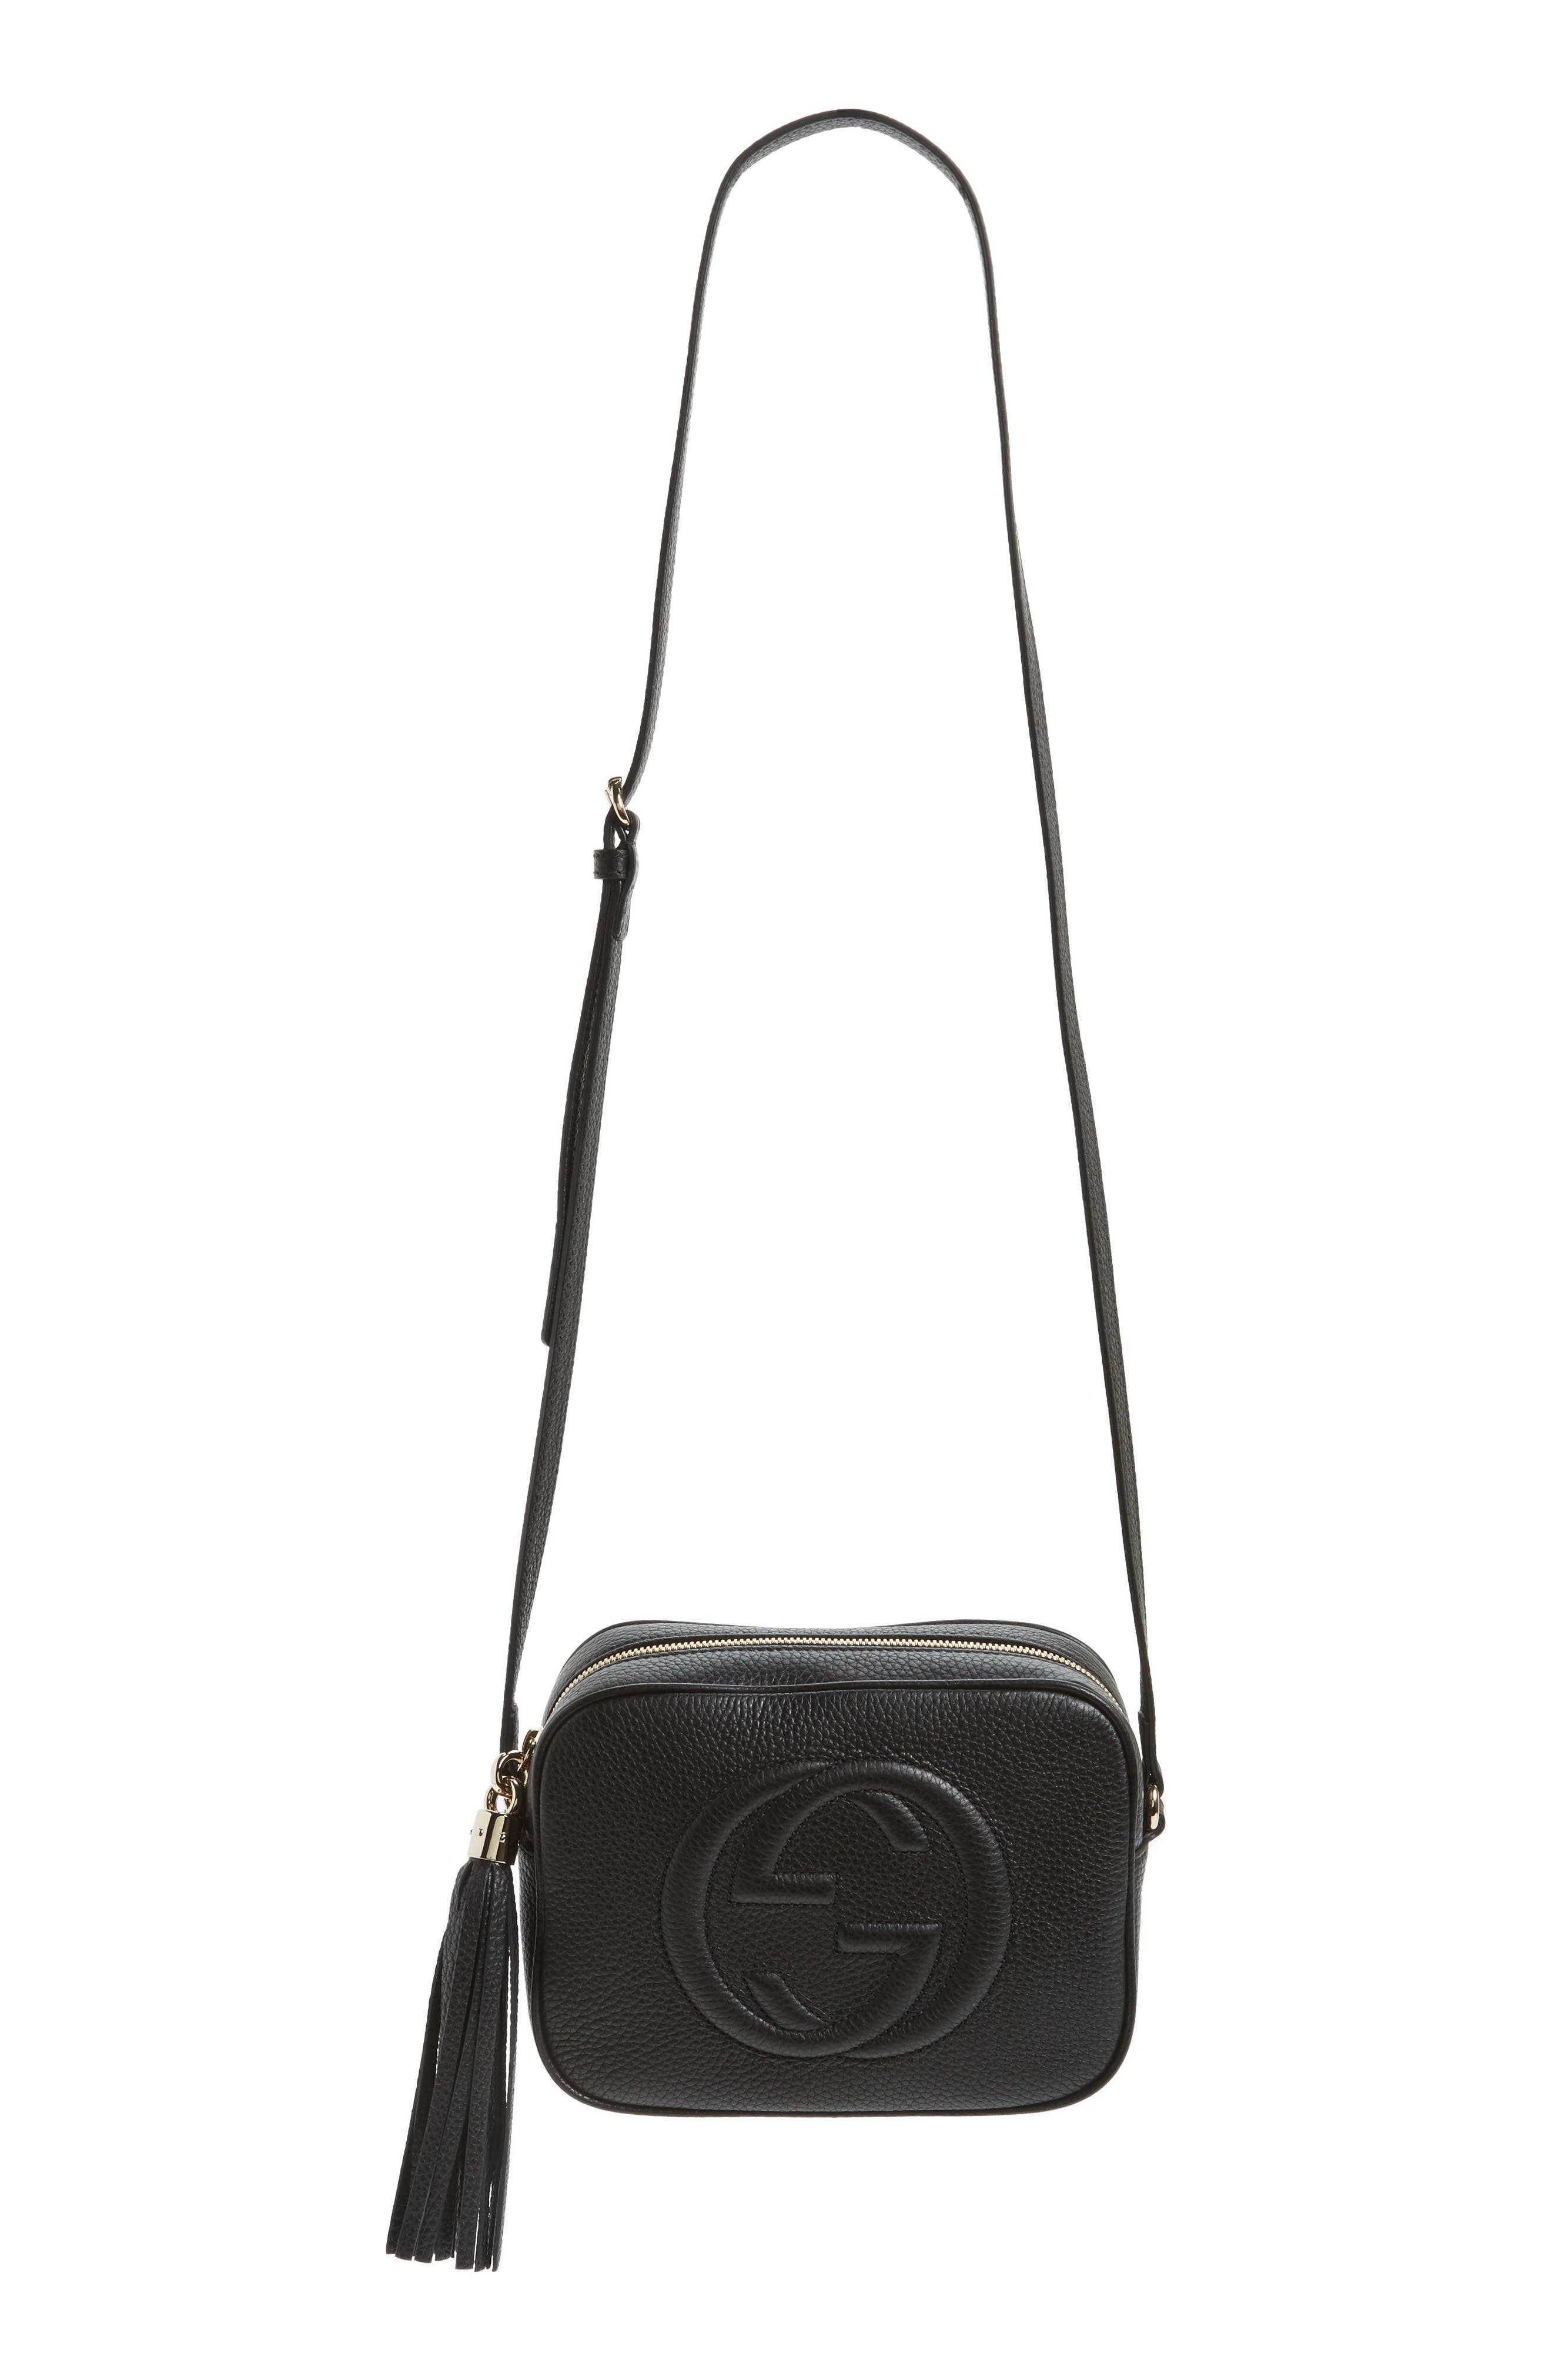 Soho Disco Leather Bag,                             Main thumbnail 1, color,                             1000 Nero